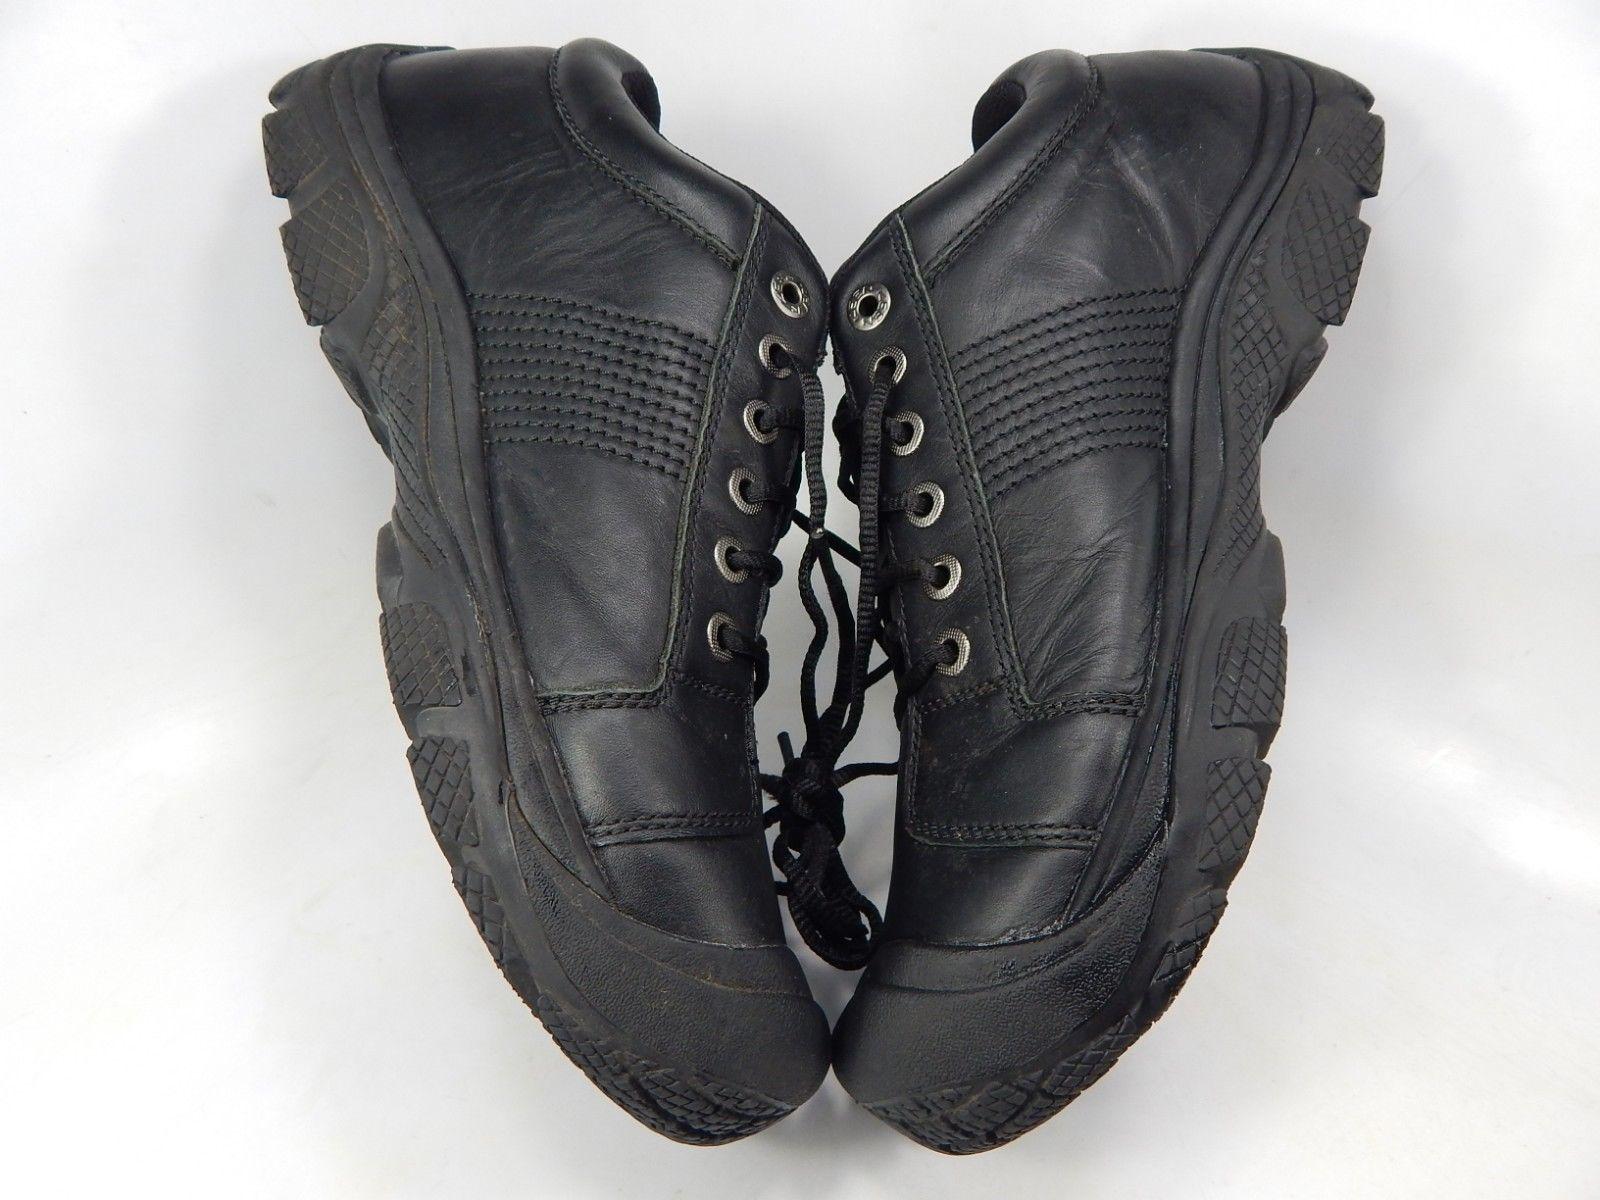 Keen PTC Oxford Size US 11 M (D) EU 44.5 Men's Soft Toe Work Shoes Black 1006980